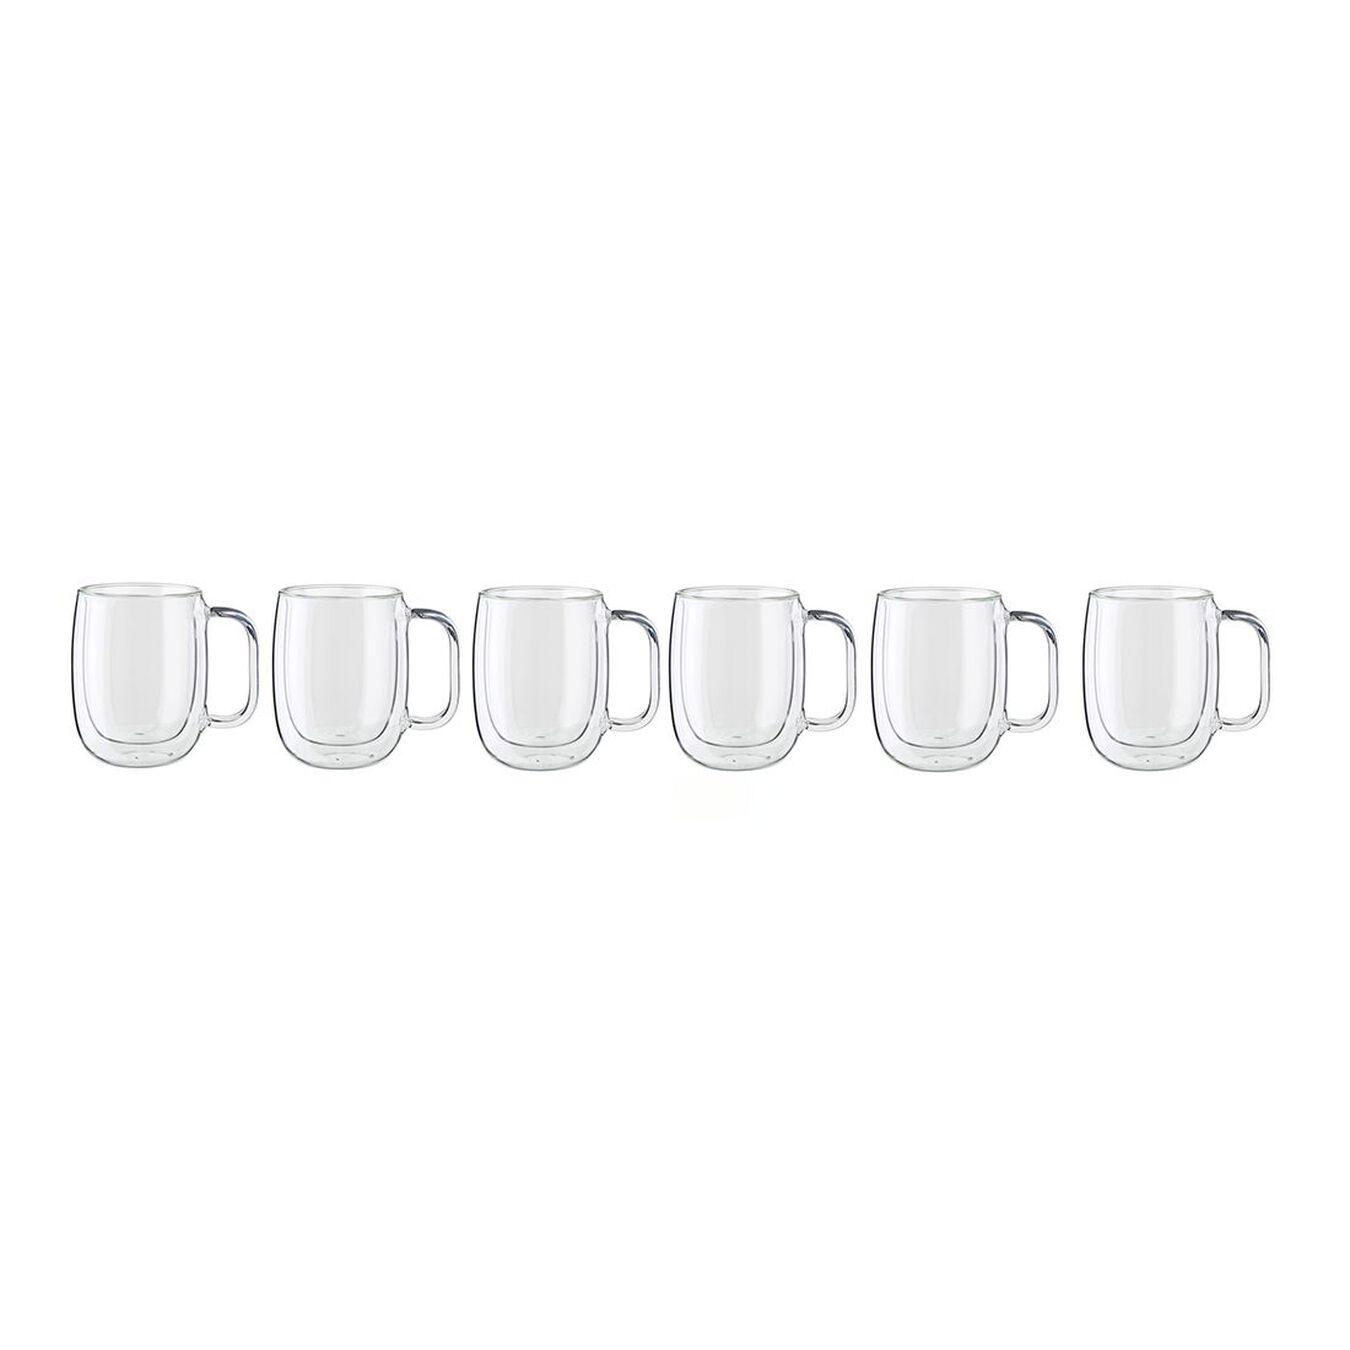 6-PC DOUBLE-WALL GLASS COFFEE MUG SET,,large 1